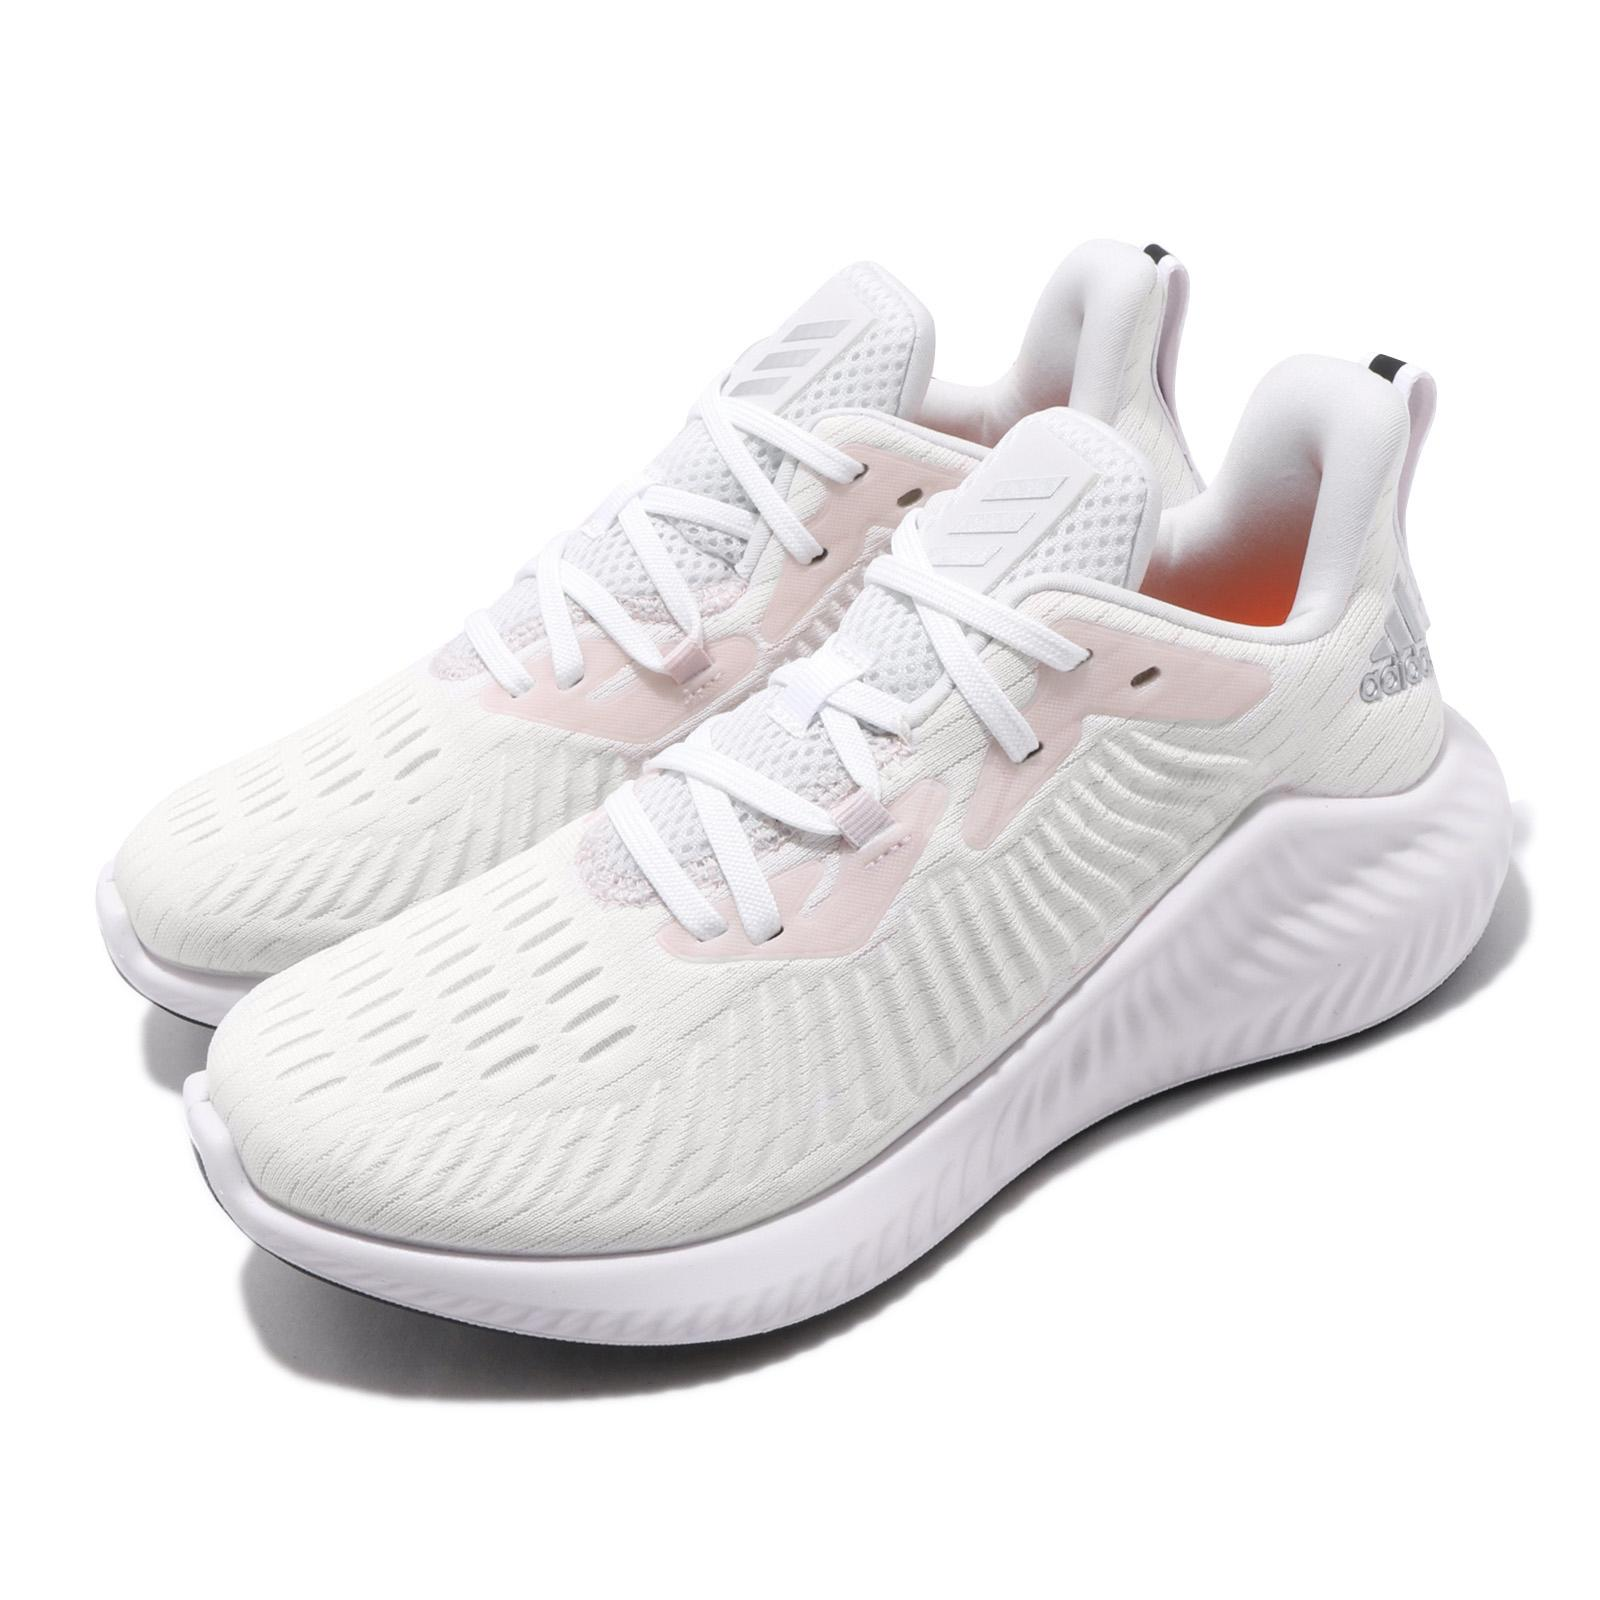 adidas AlphaBounce Plus W Crystal White